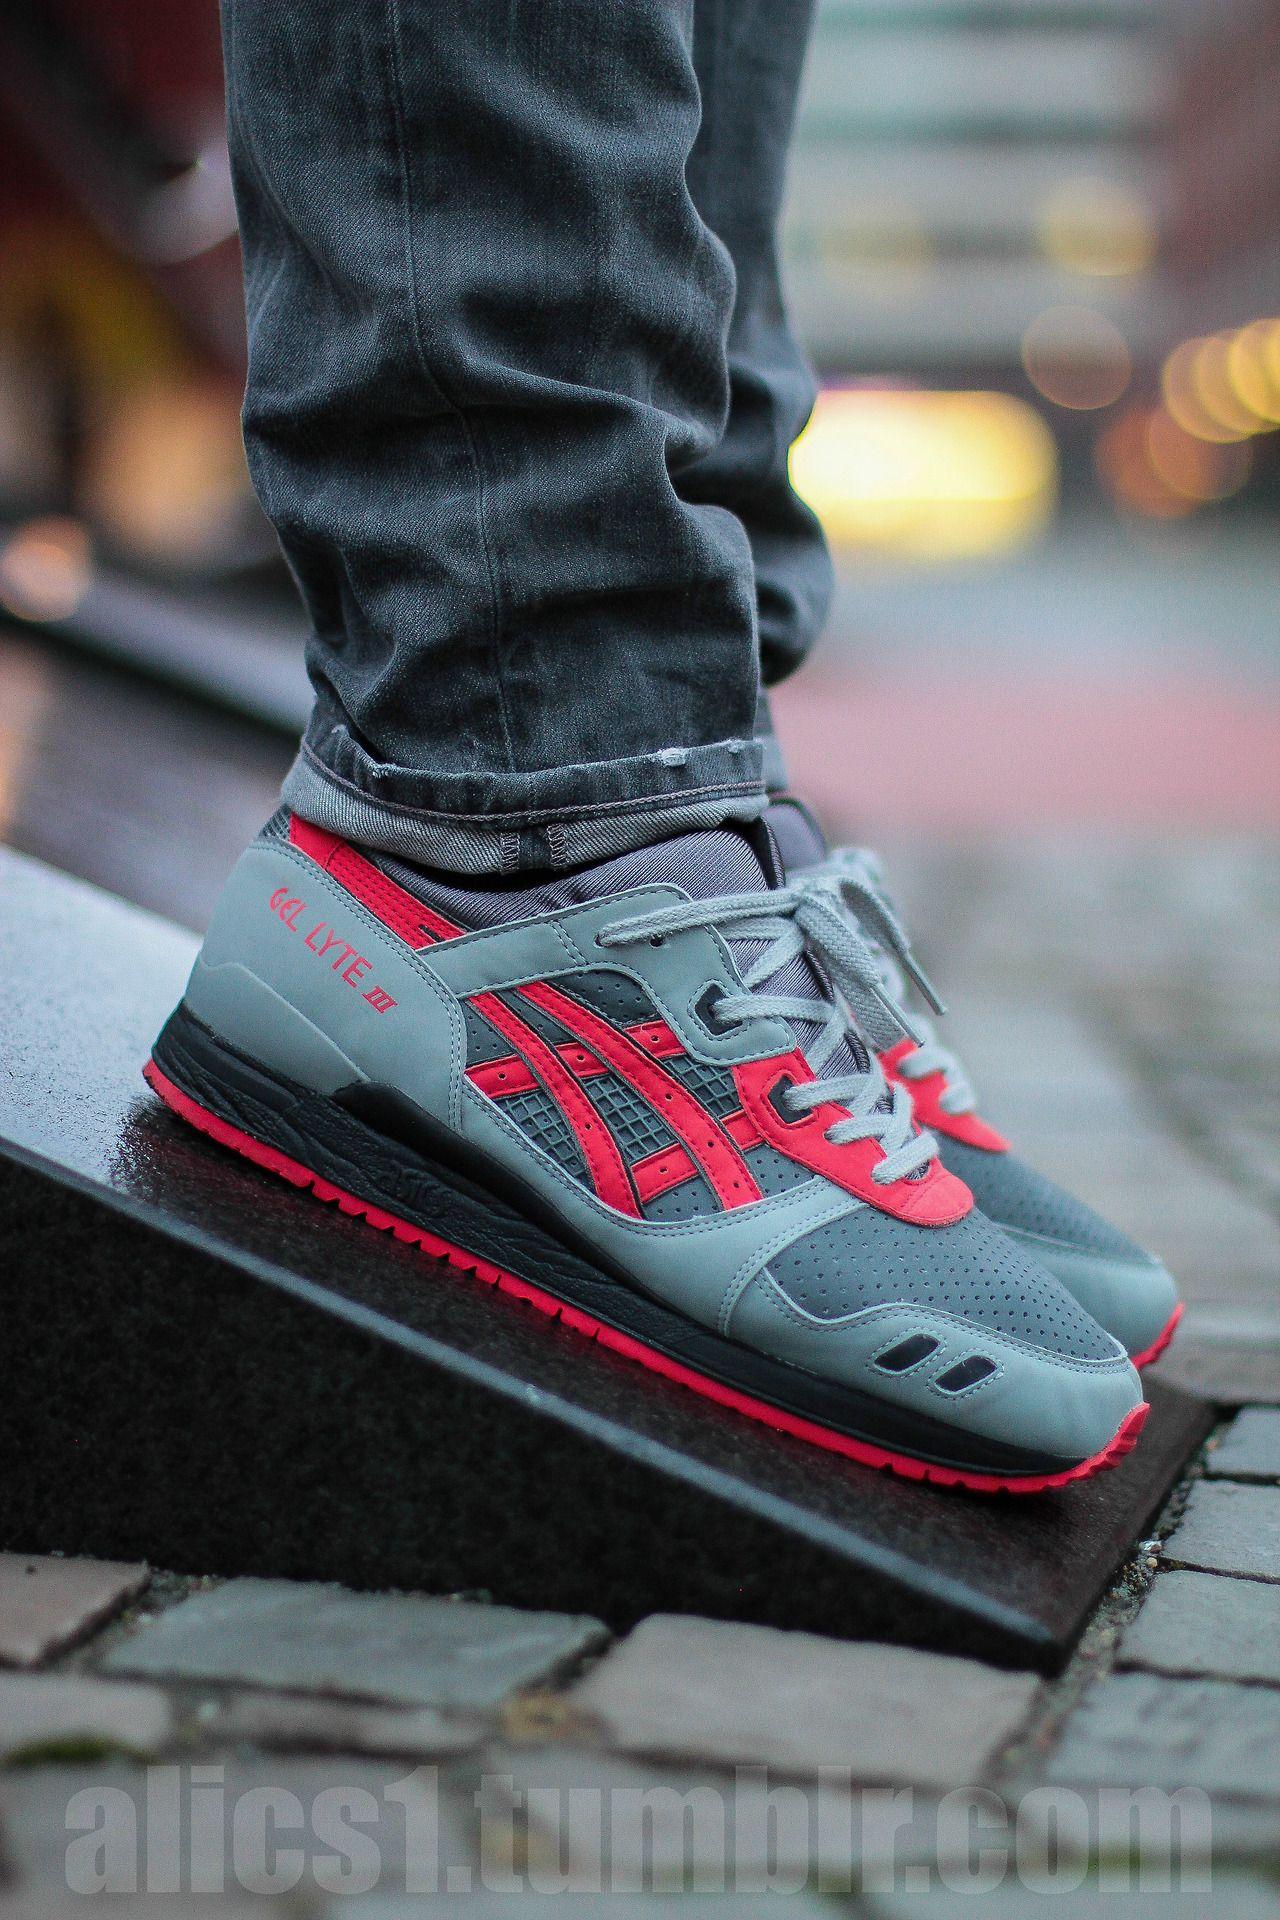 Sneakers. Asics Gel Lyte III's | Yummsy shoes | Asics schuhe